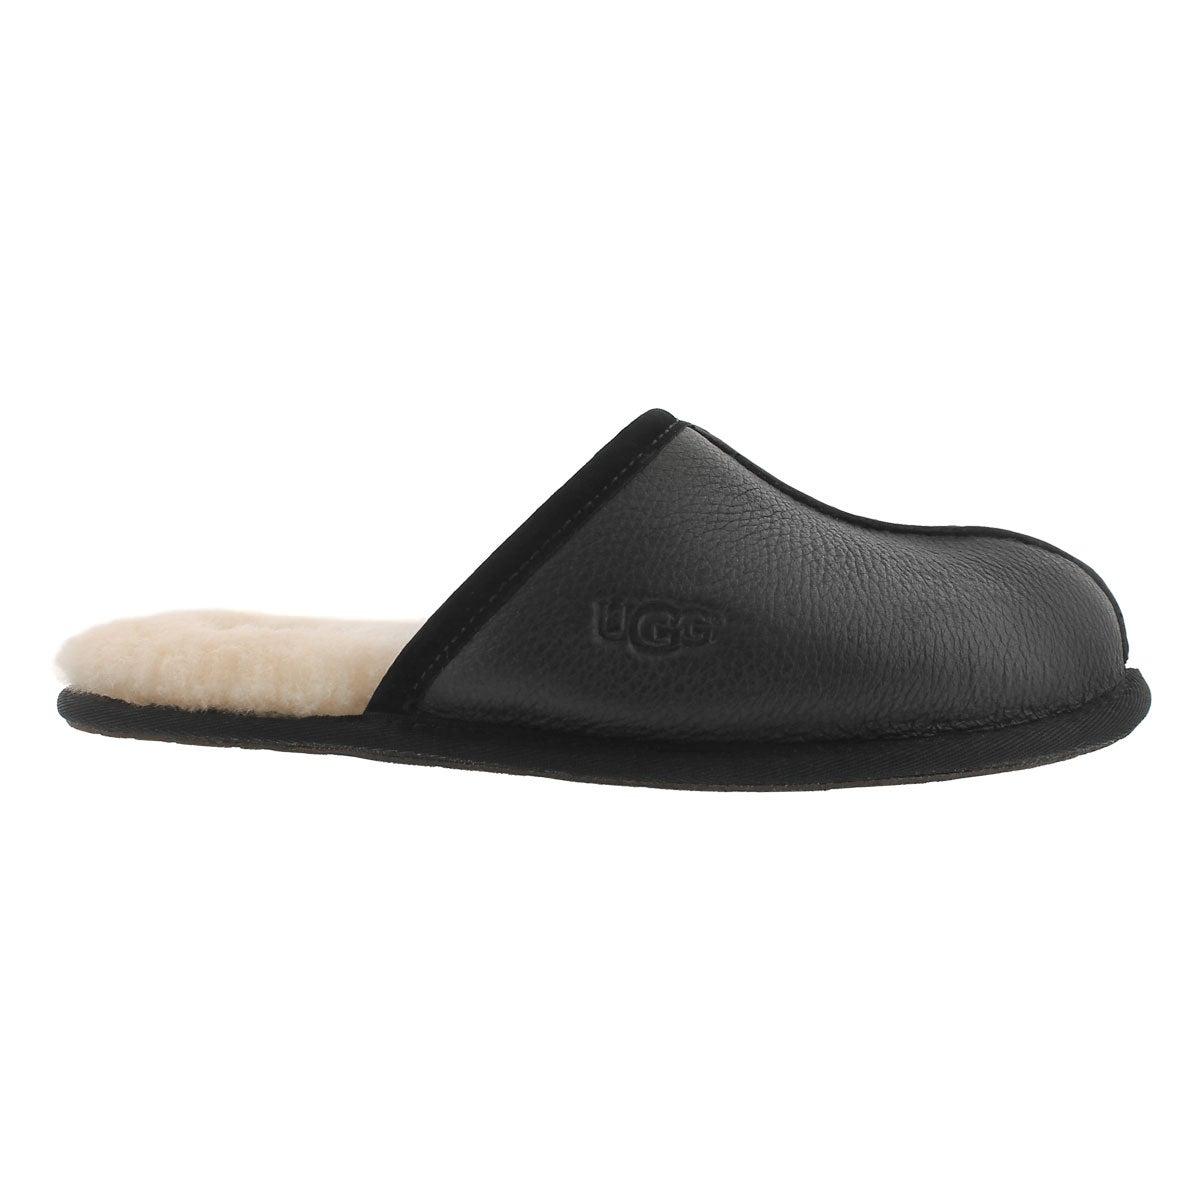 Mns Scuff black sheepskin slipper